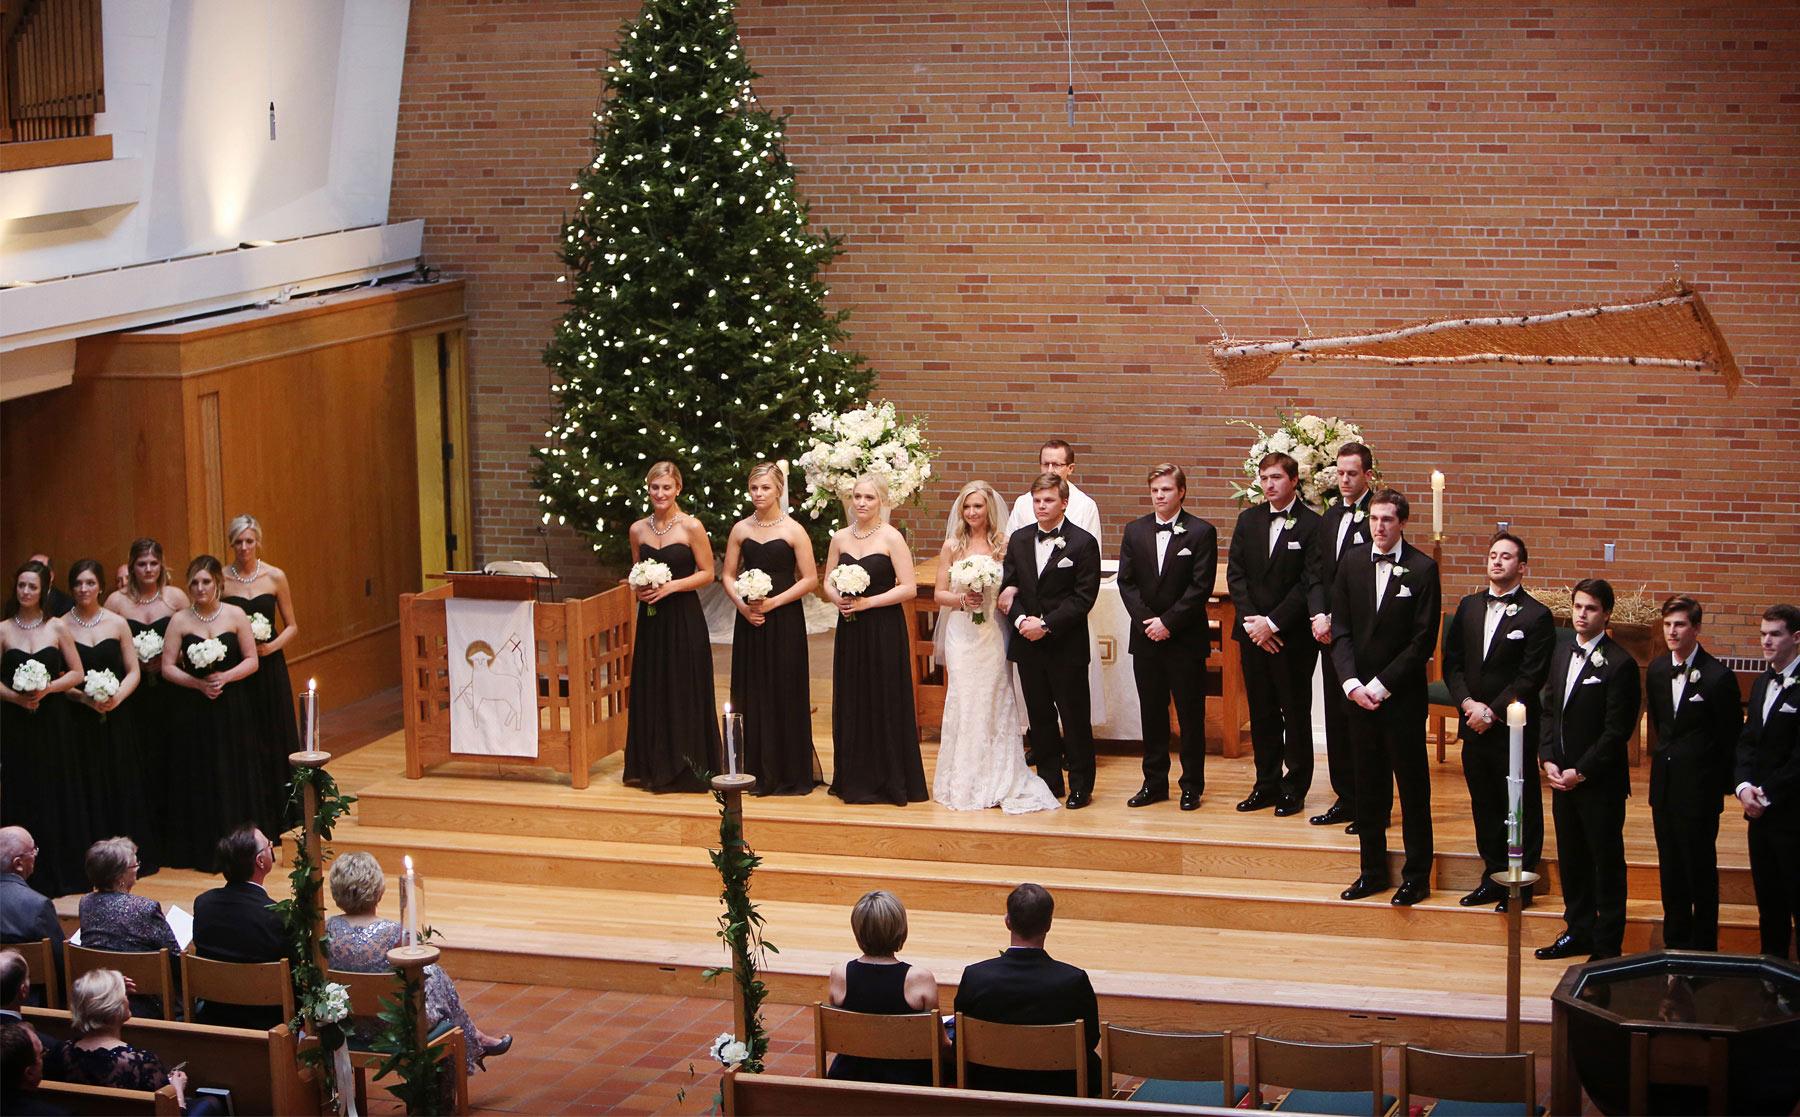 13-Minneapolis-Minnesota-Wedding-Photography-by-Vick-Photography-Ceremony--Normandale-Lutheran-Church-Caroline-and-J.jpg